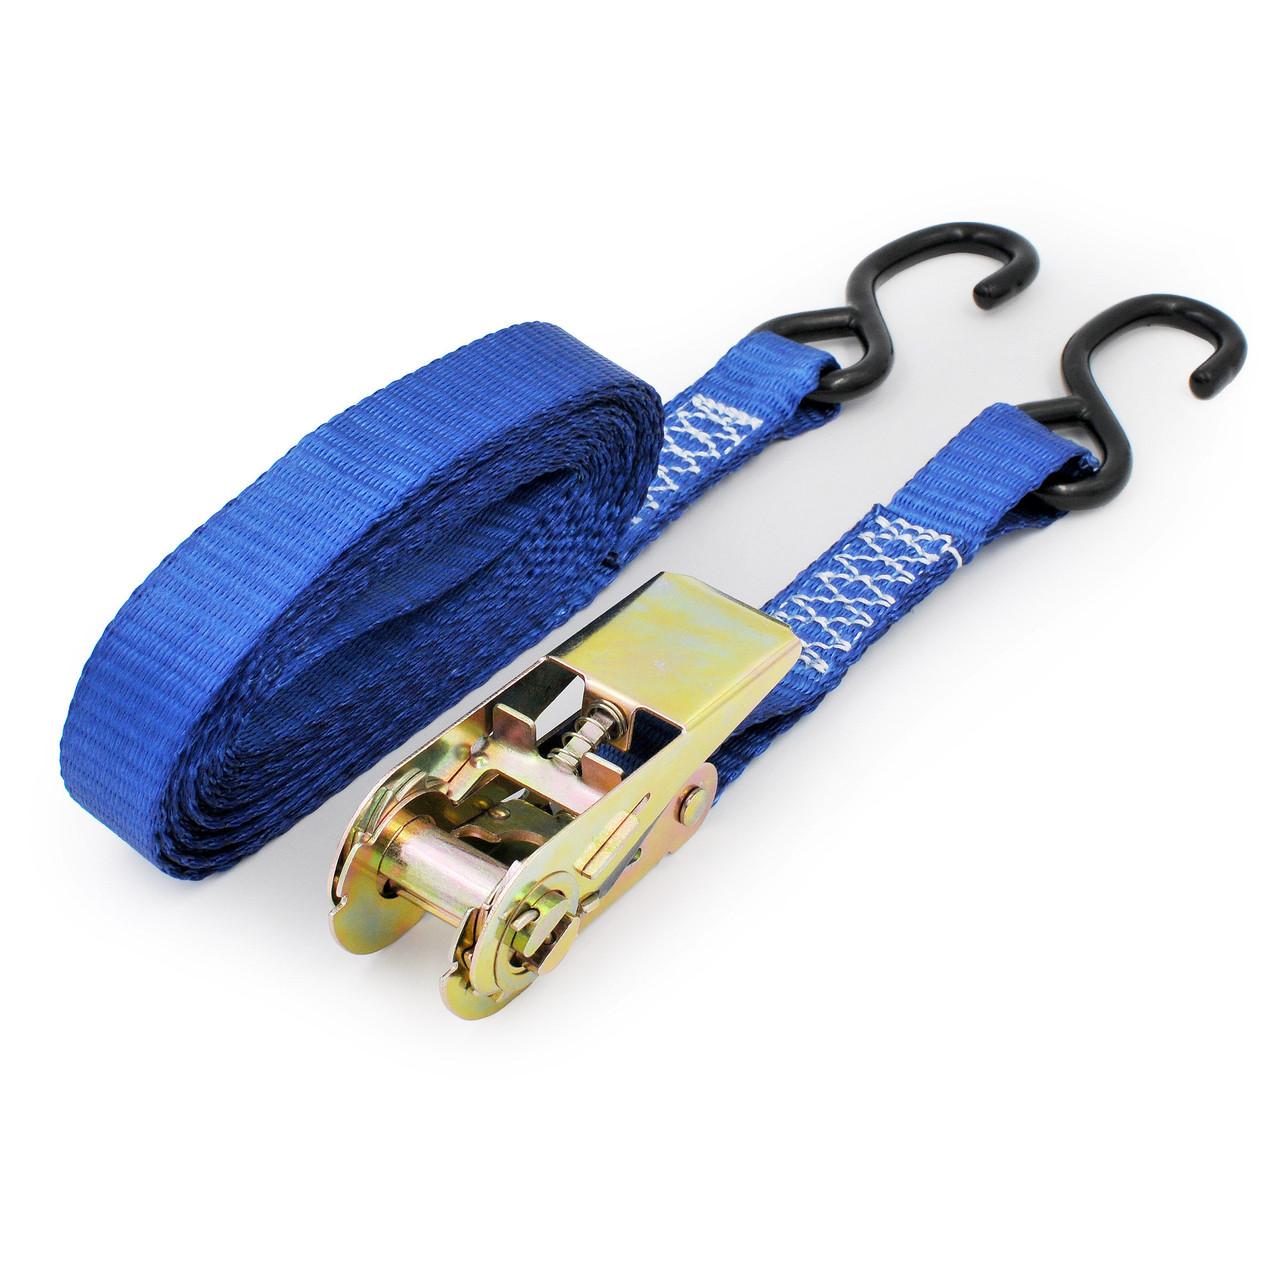 25MM wide Ladderlock Webbing cart Laggage tie down fastening strap x Pair